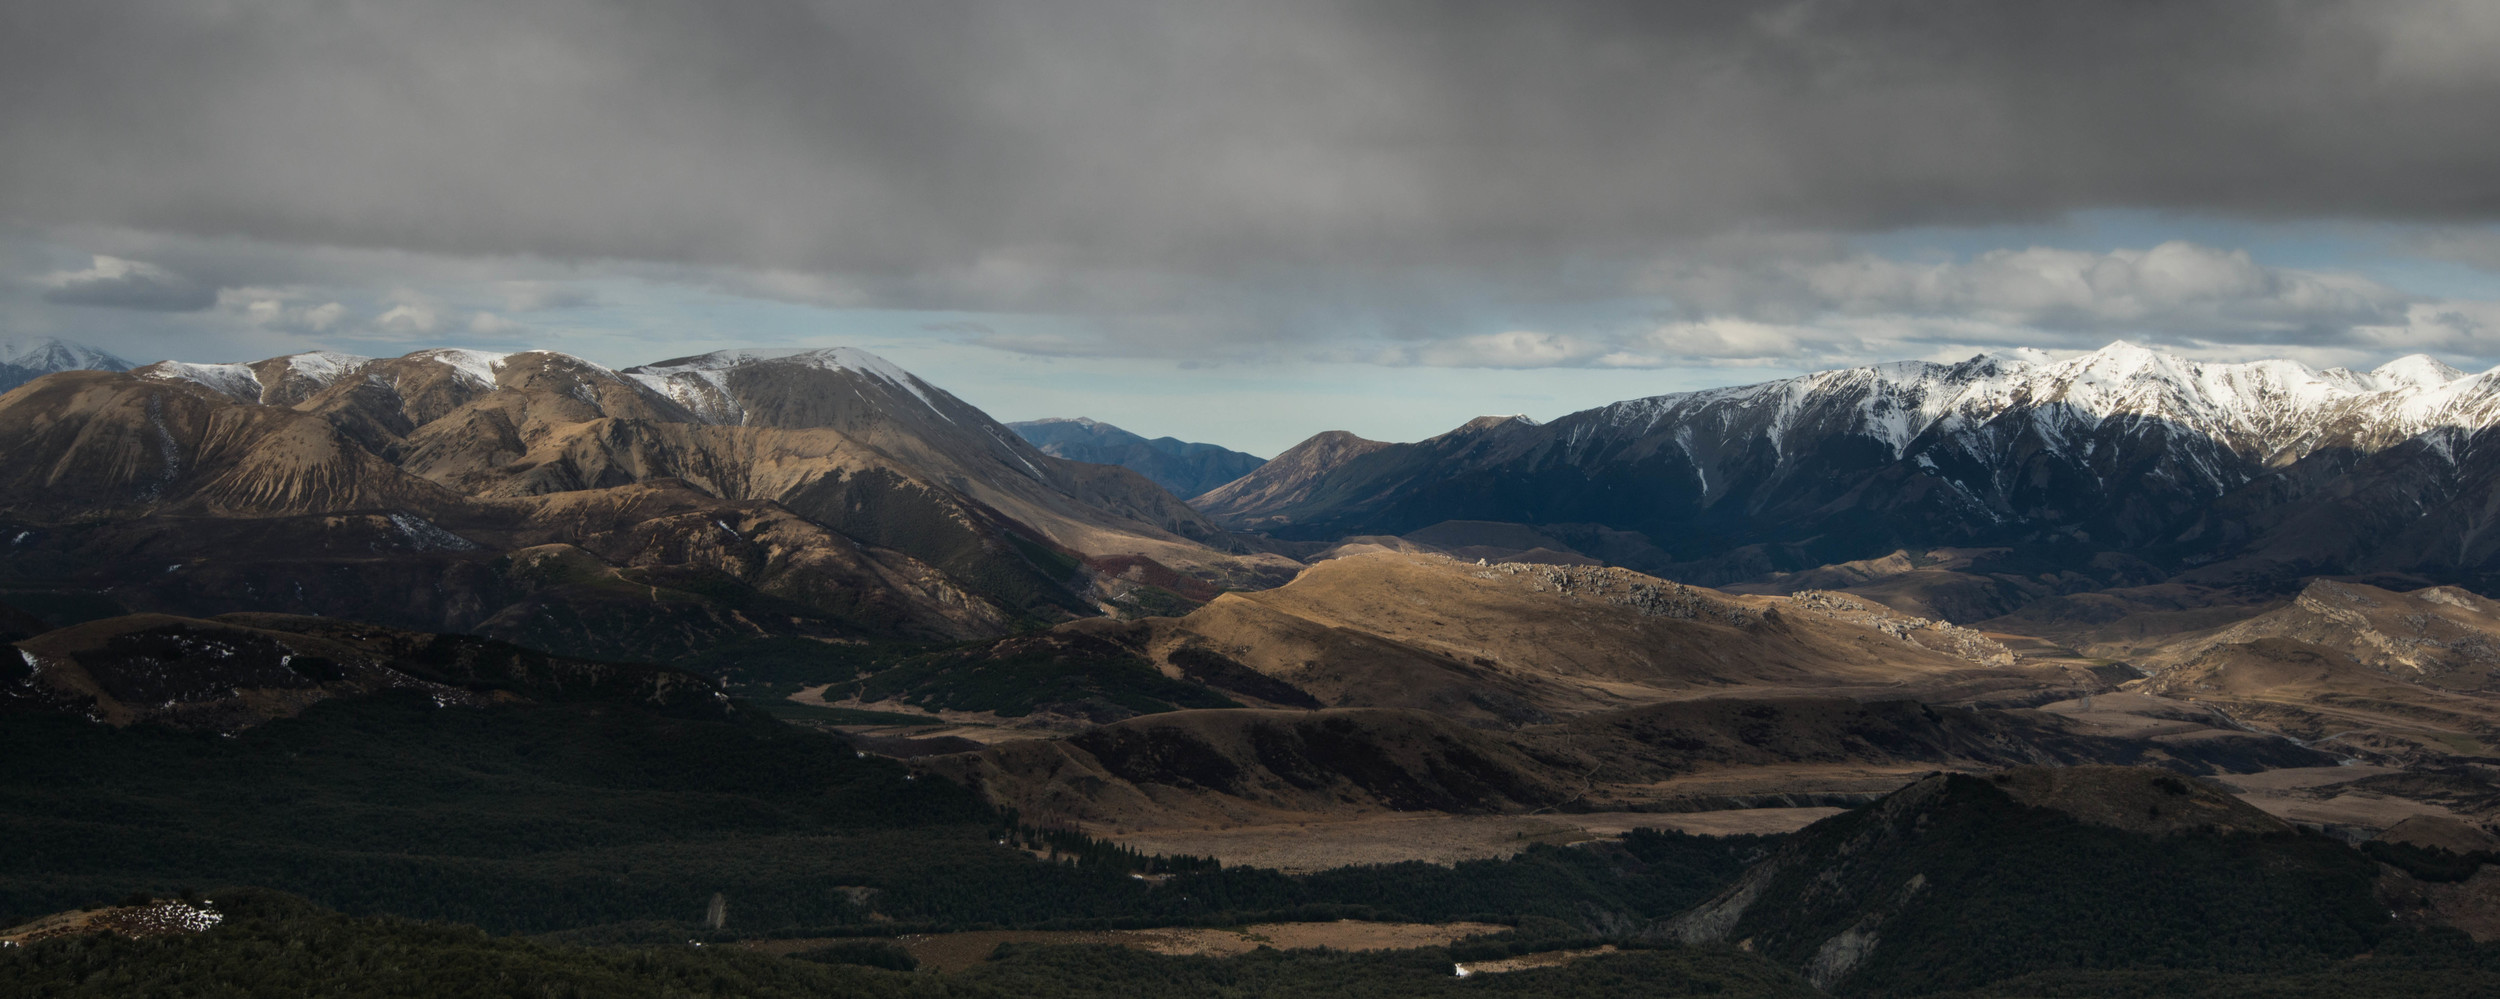 15_Cantebury_NZ_web-9.jpg